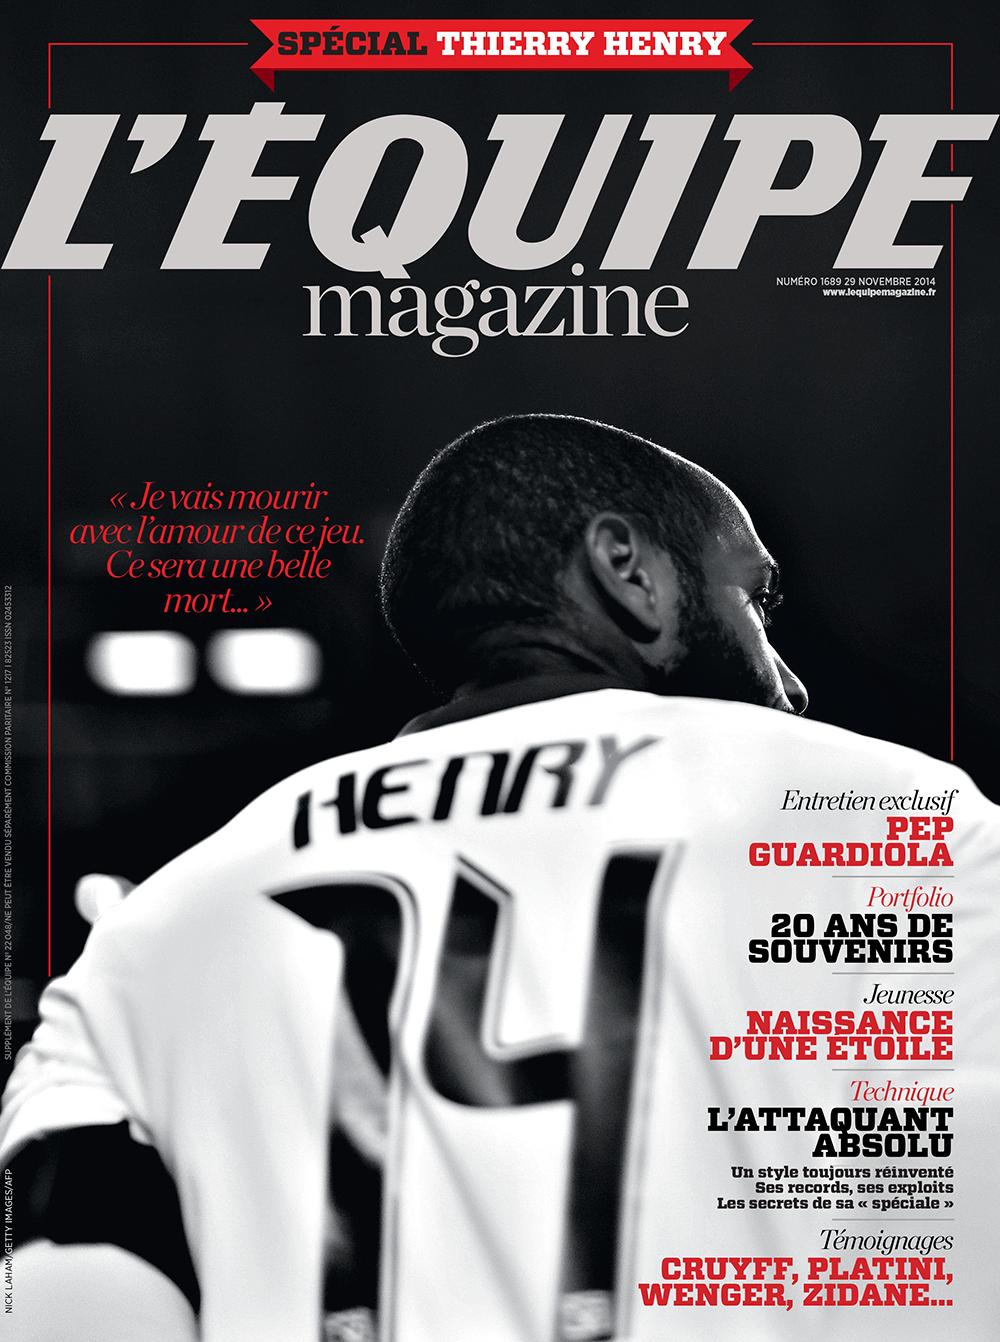 Demain : @lequipemagazine spécial Thierry Henry ! http://t.co/aOehBw4C7A